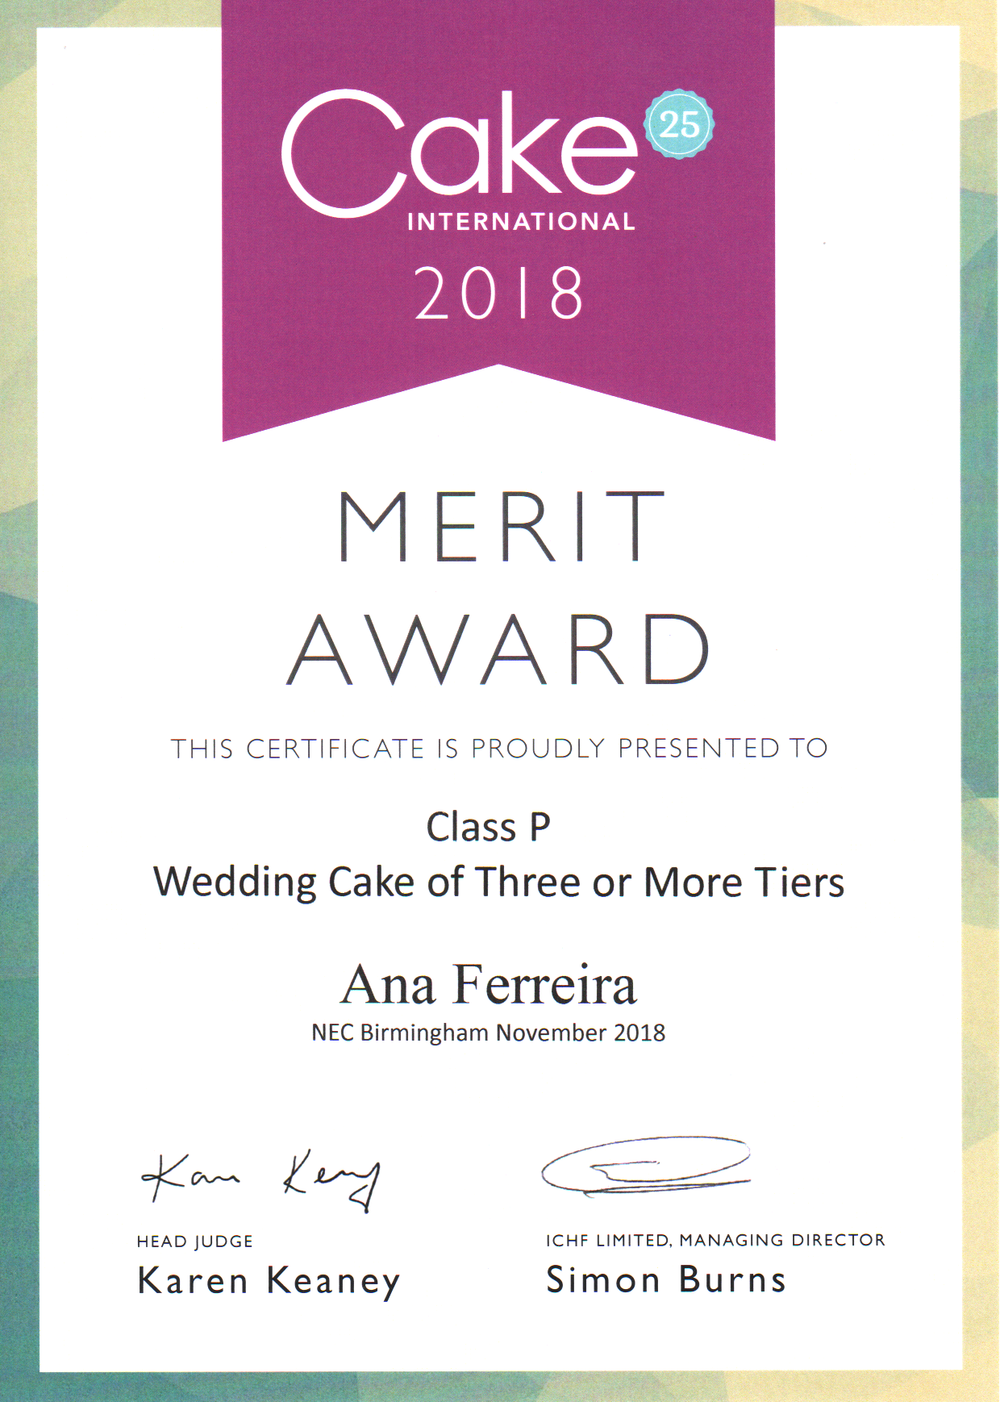 certificate 2018.png